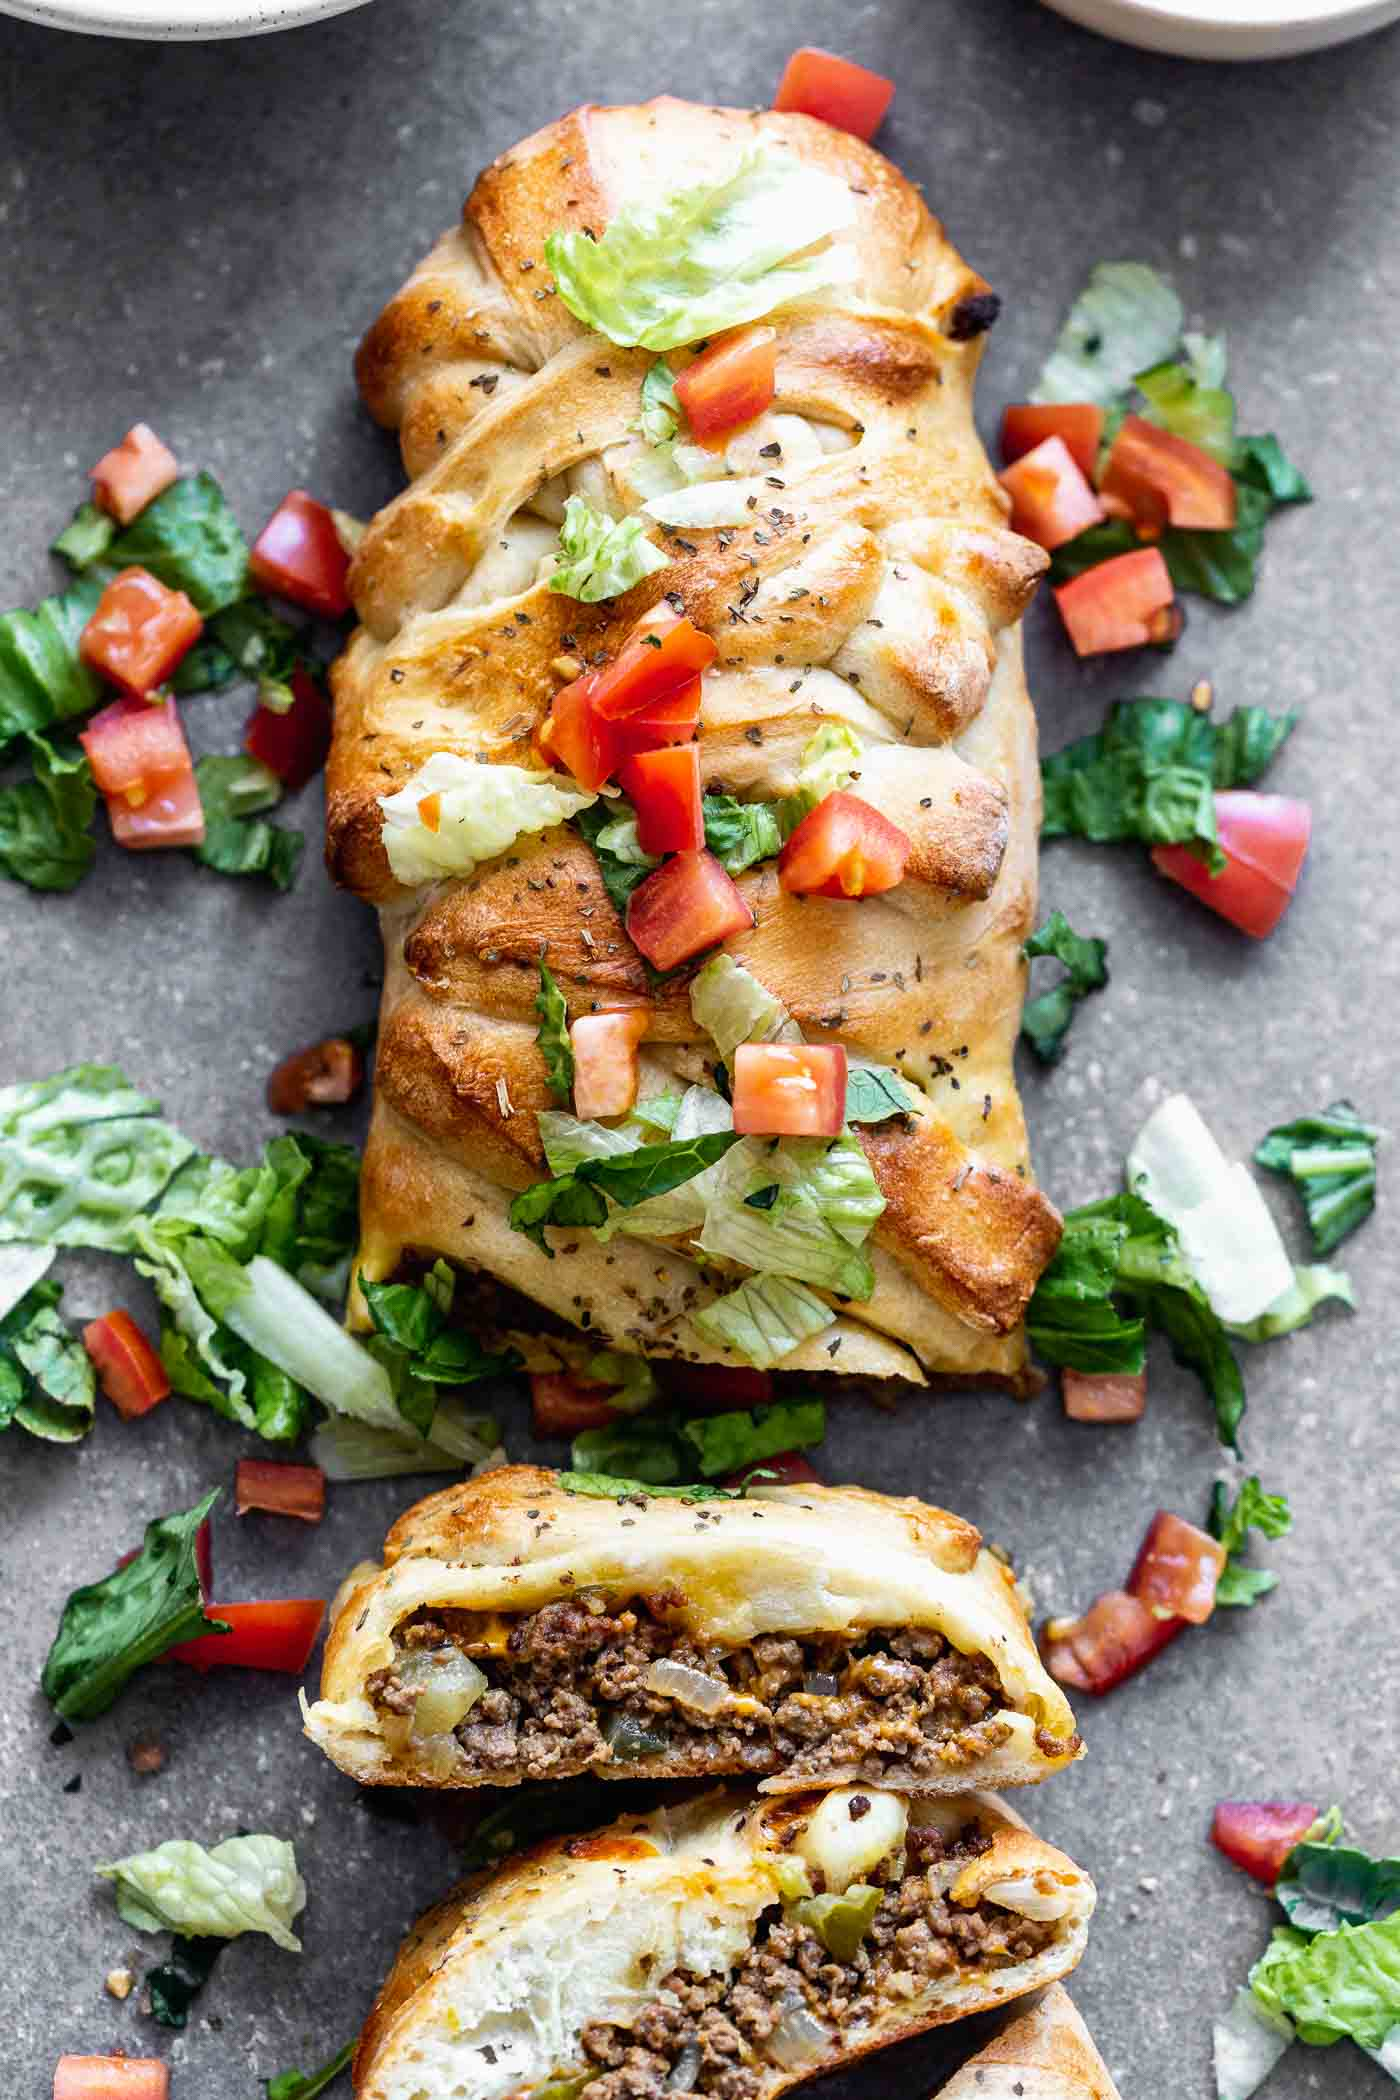 Cheeseburger Stromboli